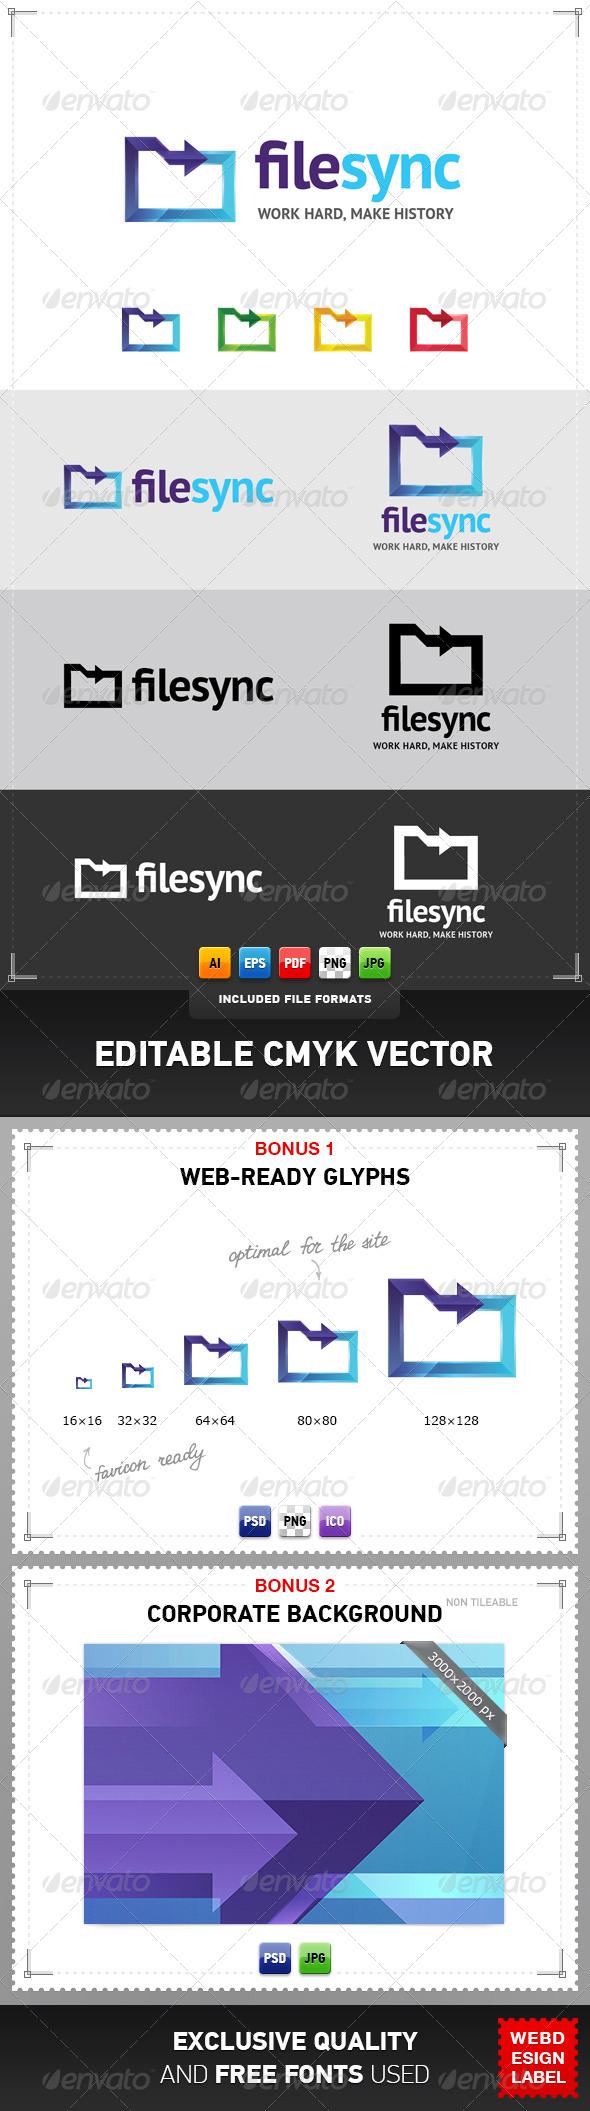 File Sync Logo - Objects Logo Templates